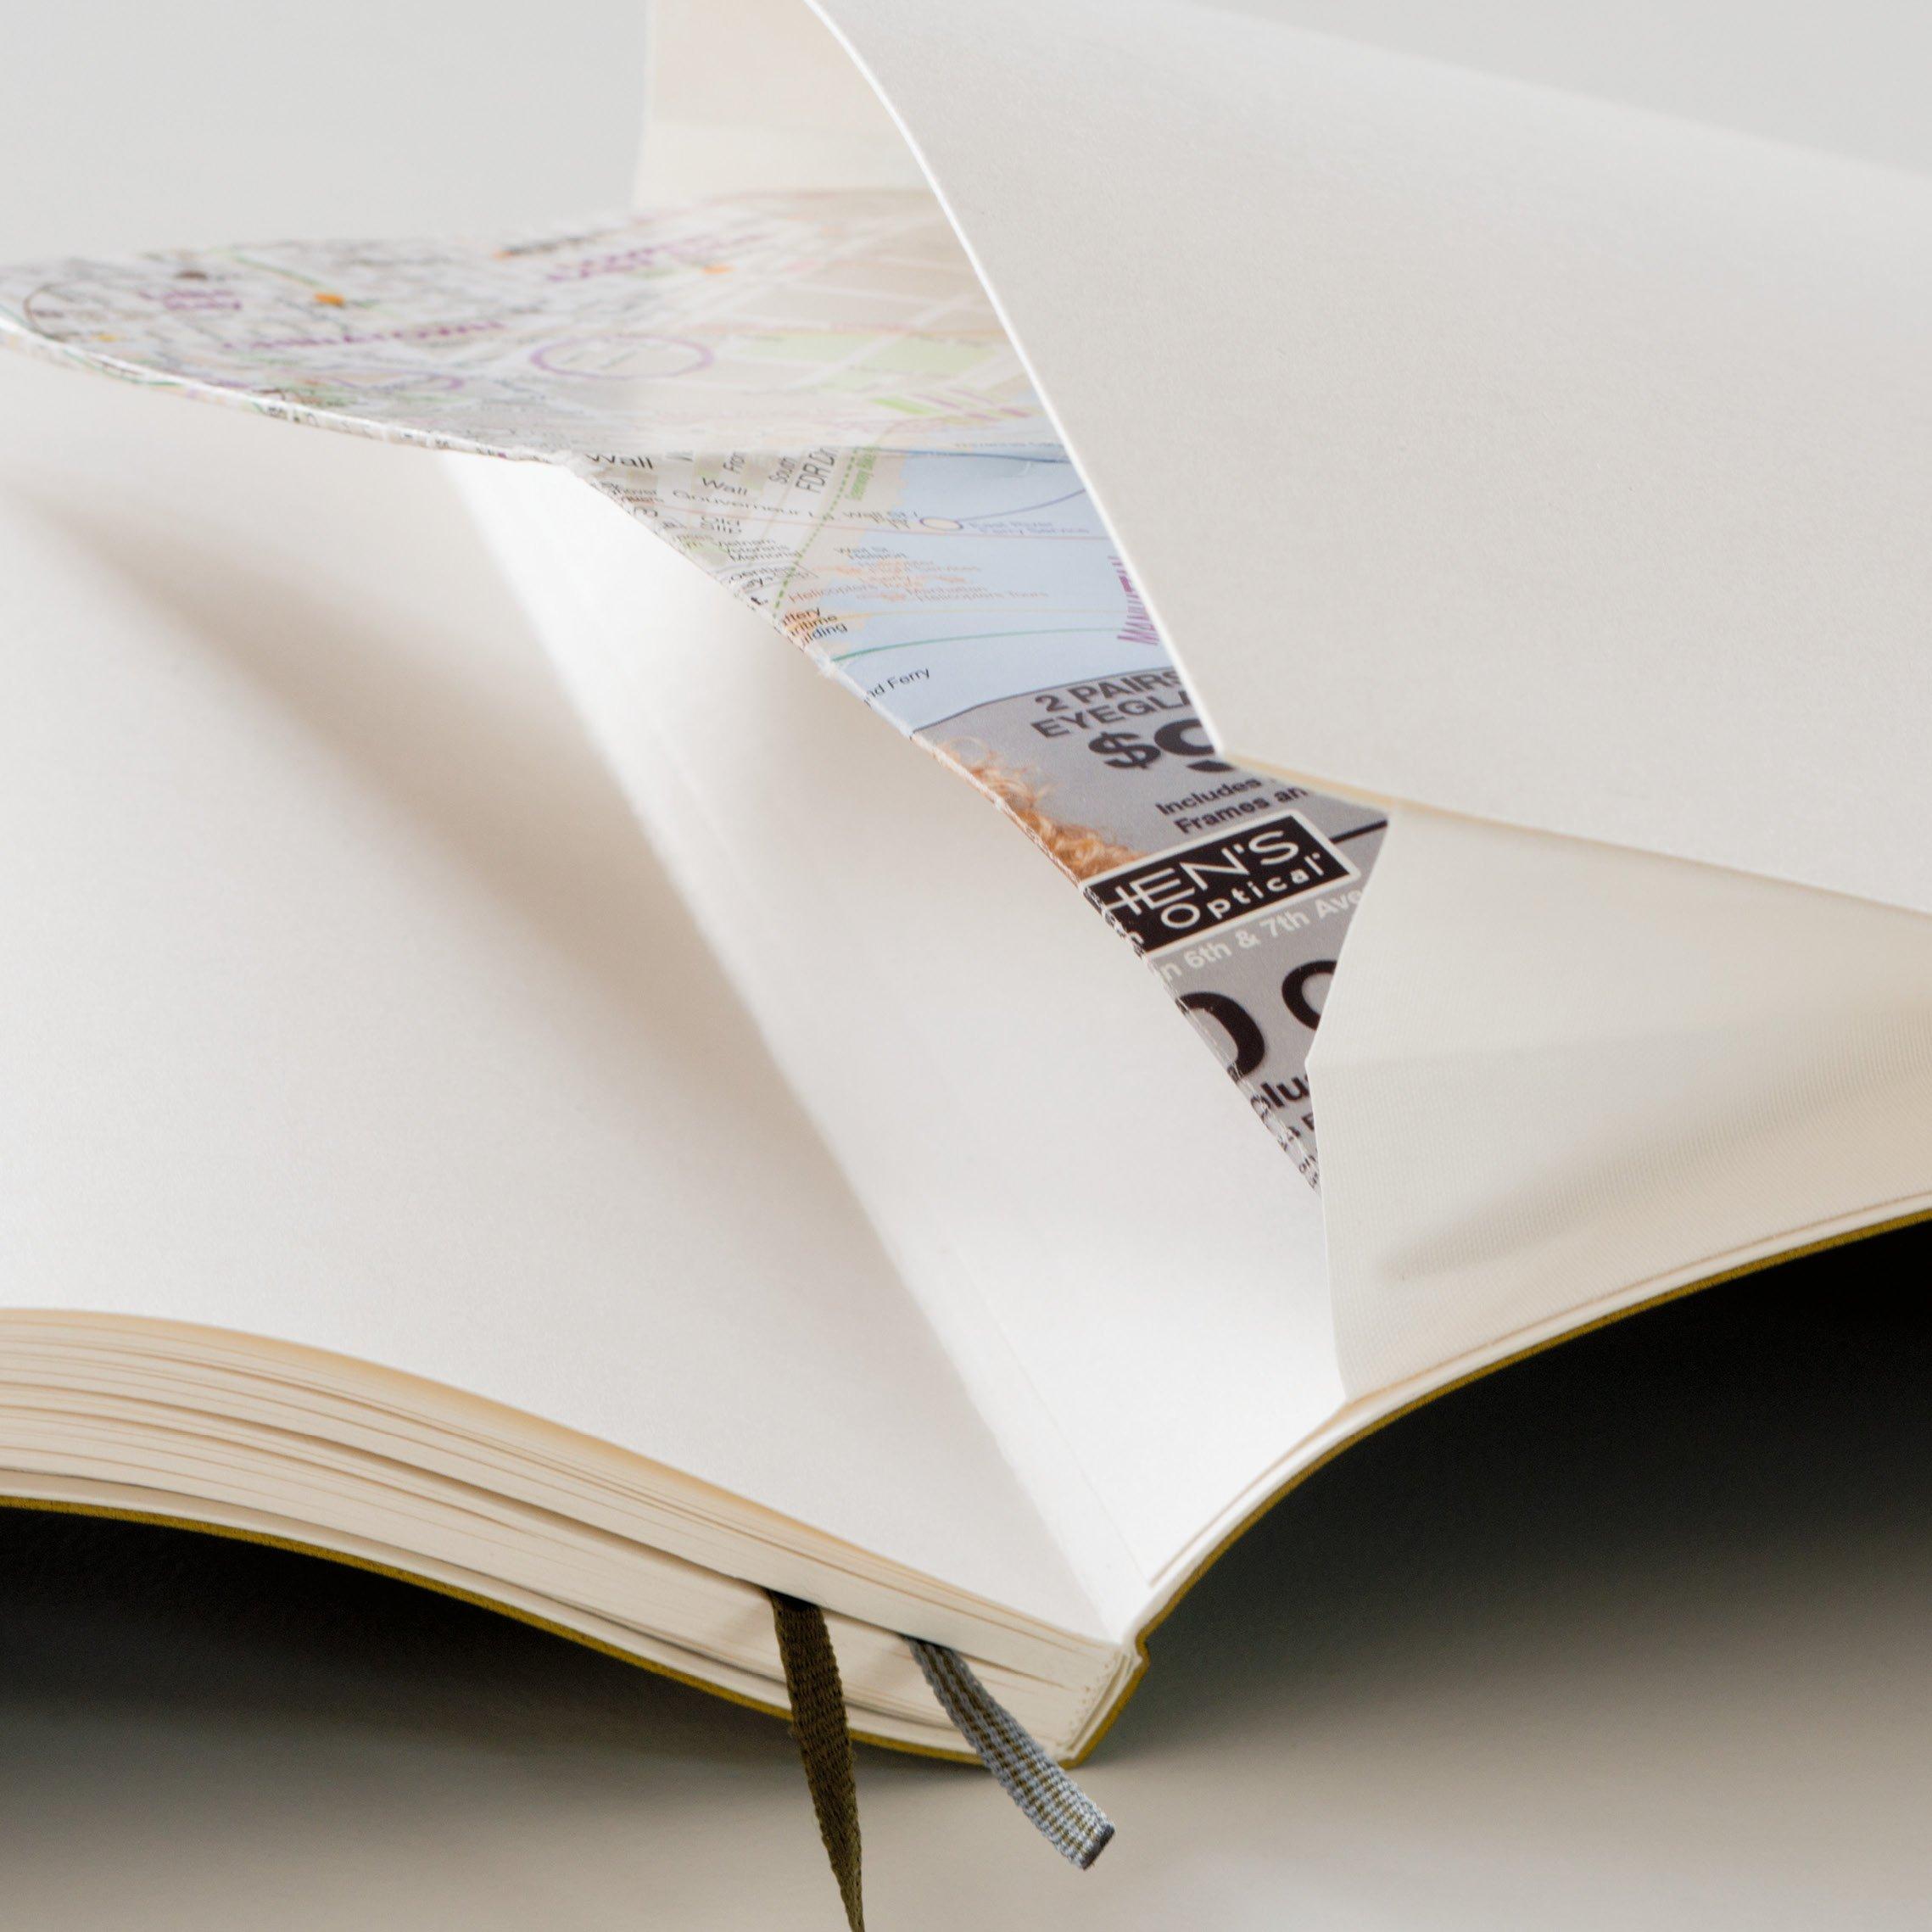 Leuchtturm1917 Medium Size B5 Softcover Notebook Plain Black by LEUCHTTURM1917 (Image #6)